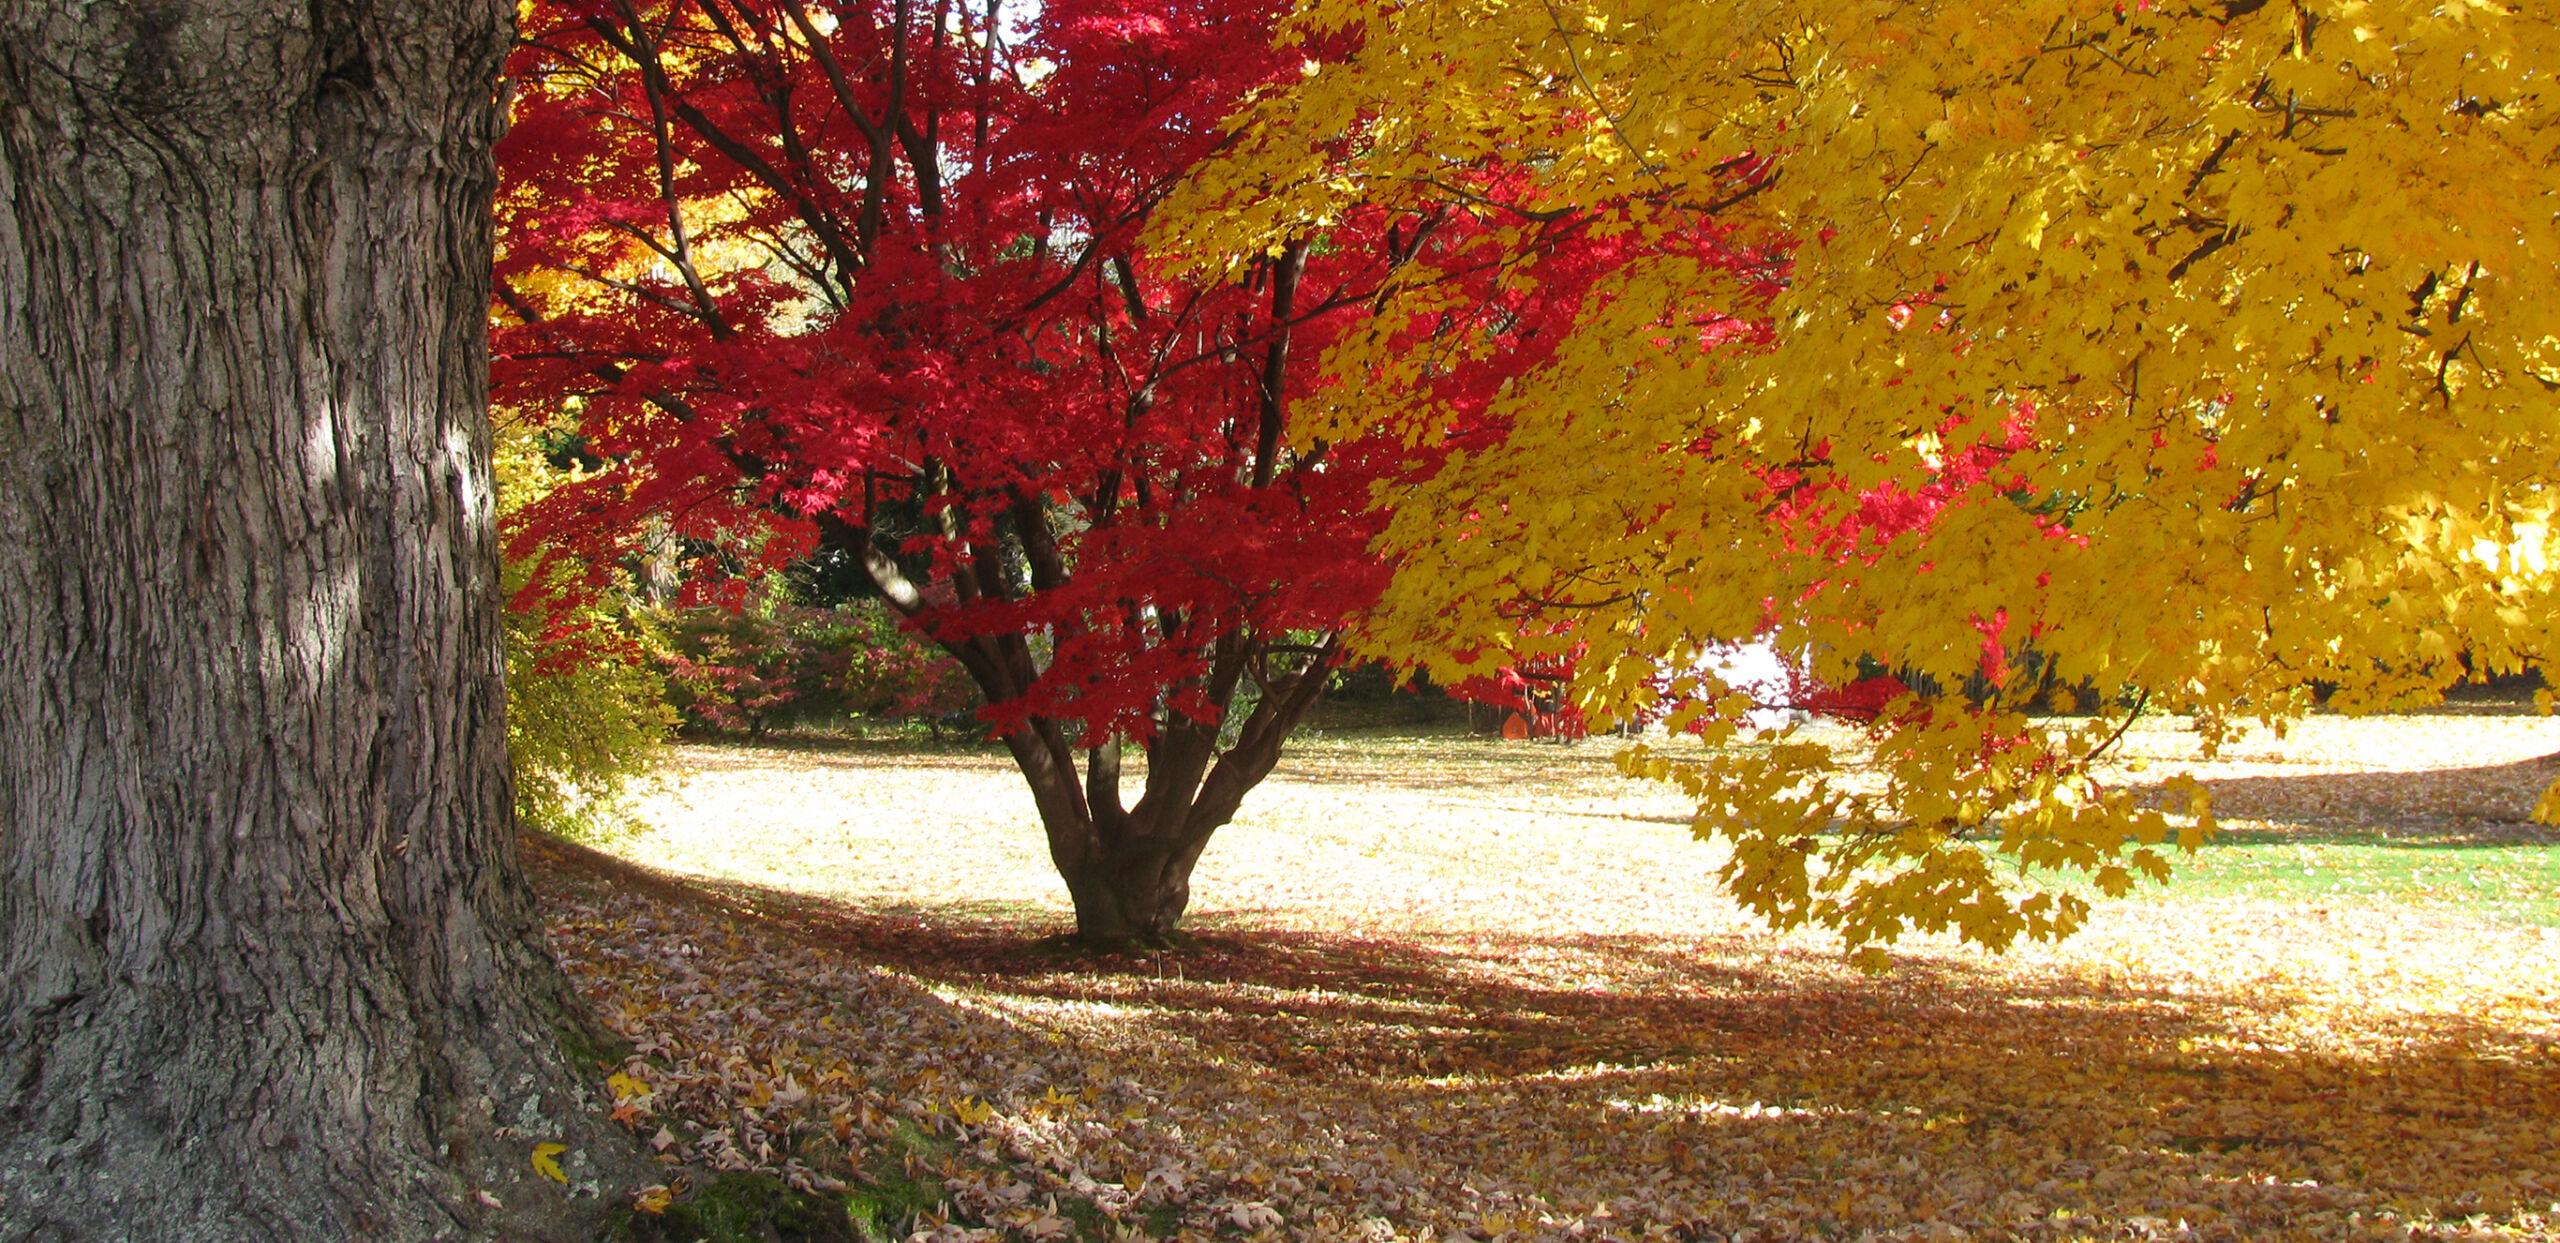 Autumn scene, Cooley Dickinson Health Care System, Northampton, MA 01060.